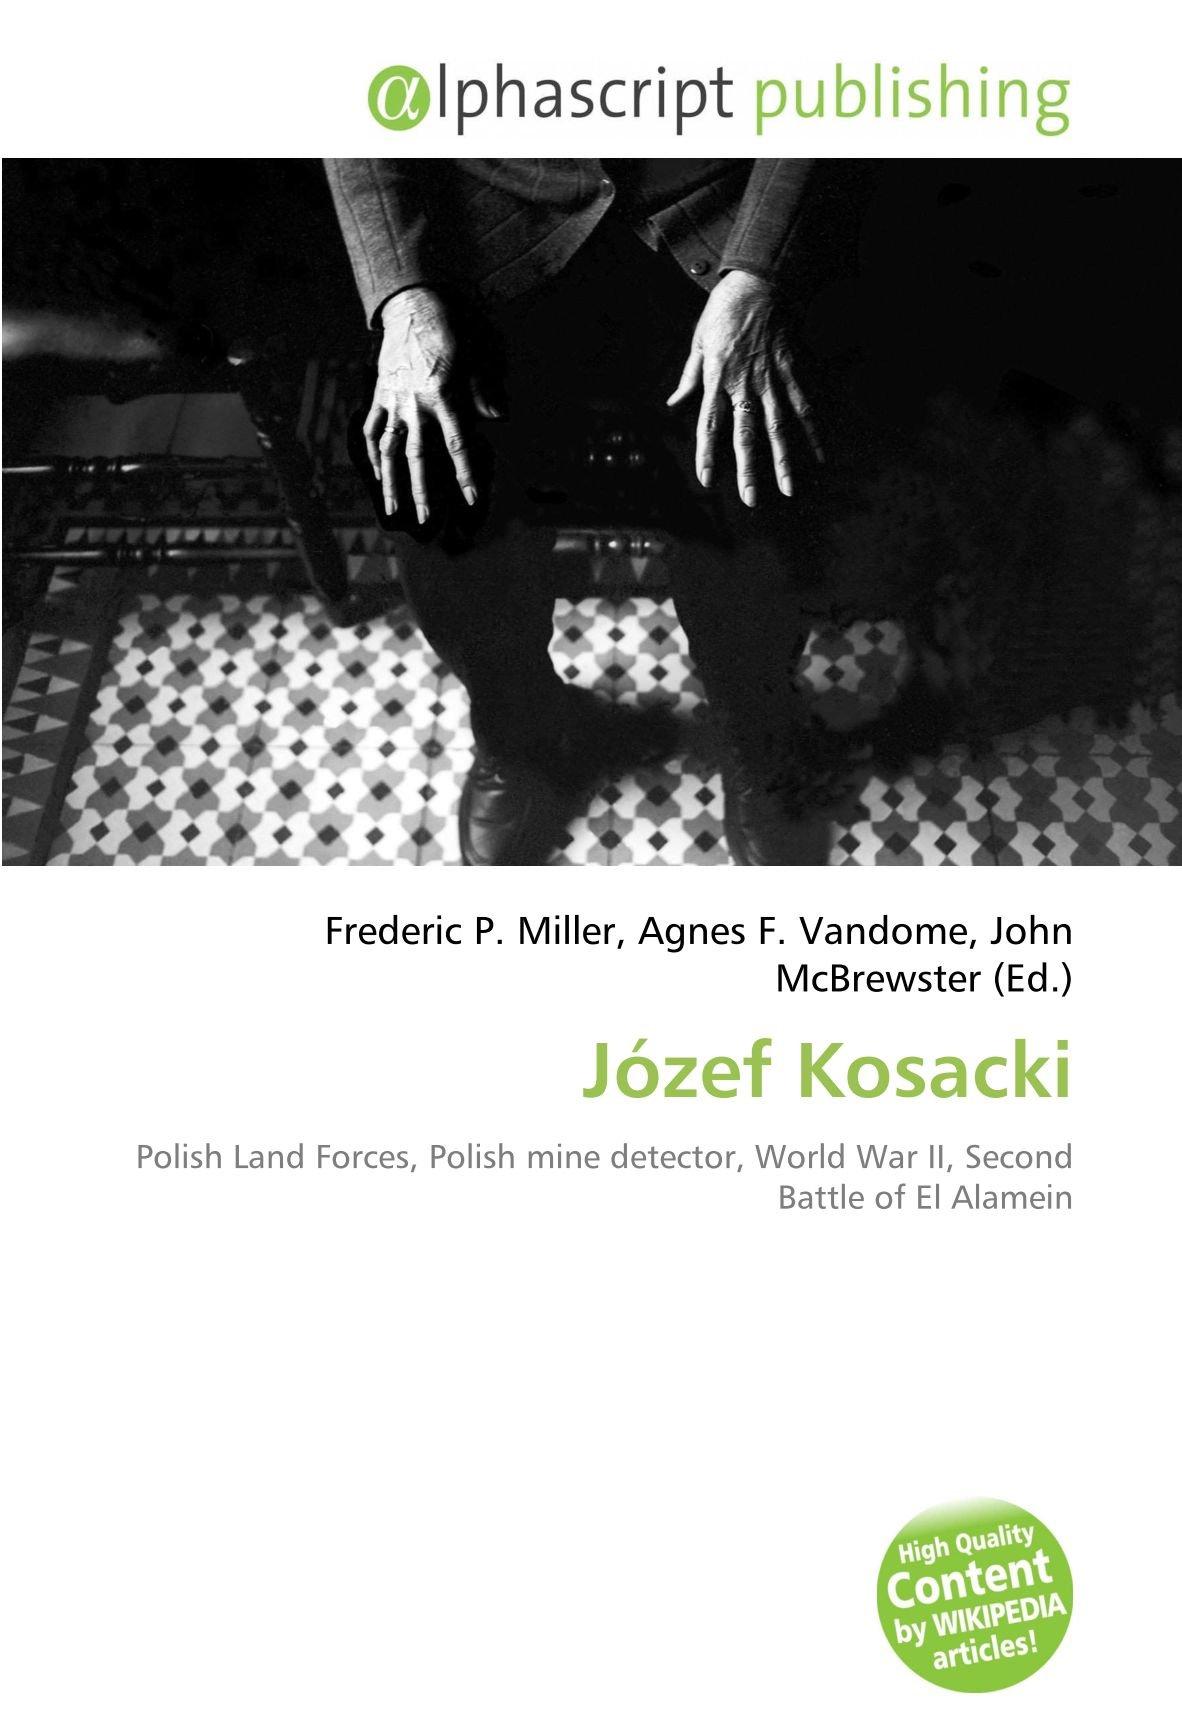 Józef Kosacki: Polish Land Forces, Polish mine detector, World War II, Second Battle of El Alamein: Amazon.es: Frederic P. Miller, Agnes F. Vandome, ...